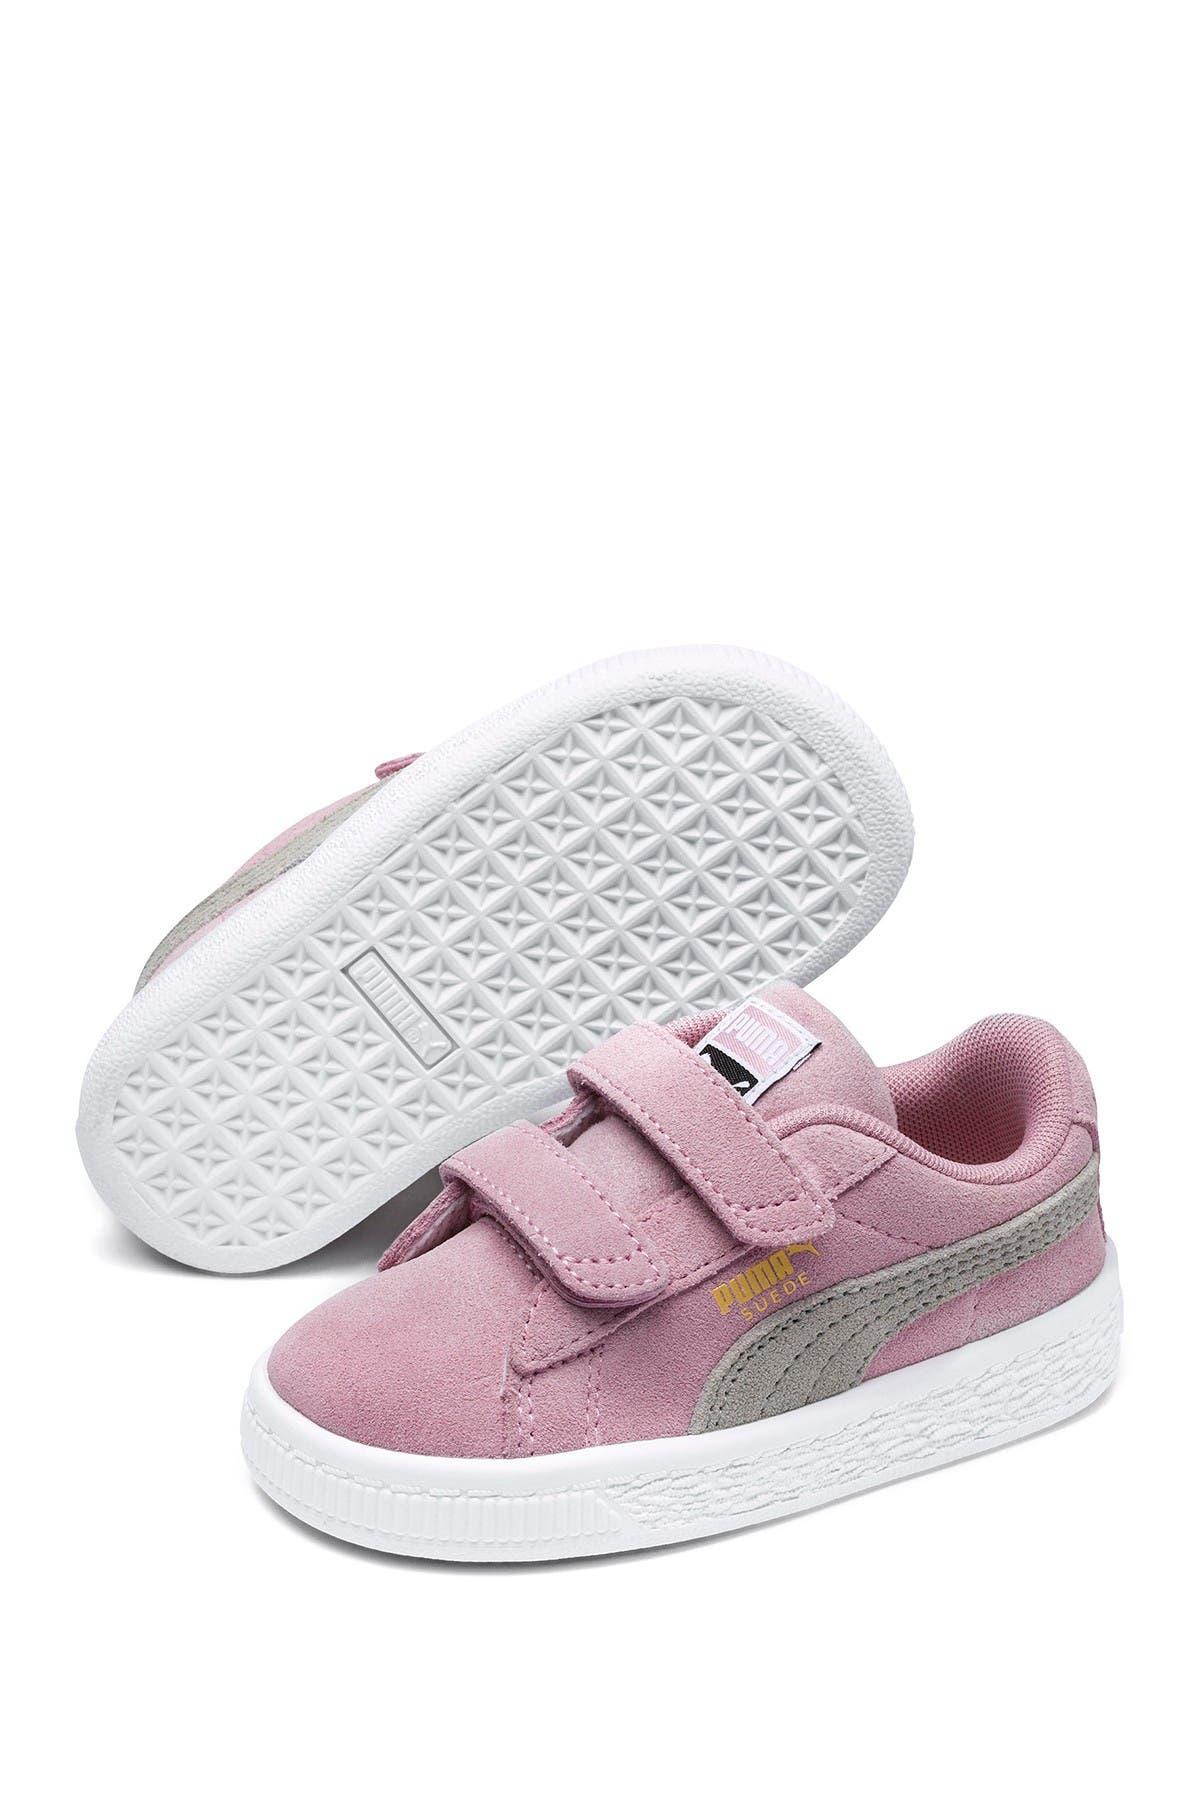 Image of PUMA Suede 2 Strap Sneaker